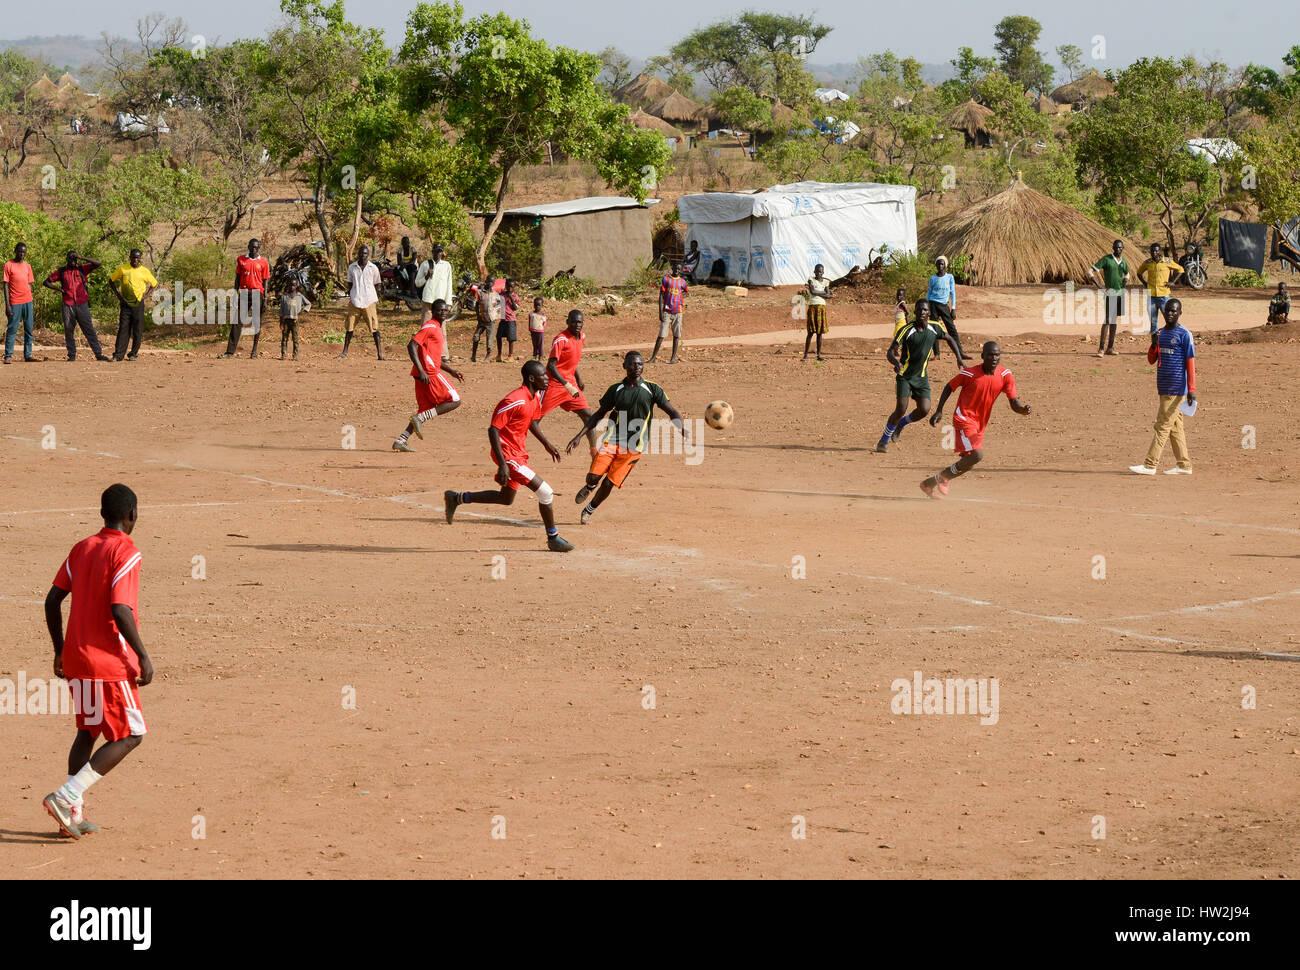 UGANDA, Arua, Yumbe, south sudanese refugees in Bidi Bidi refugee settlement , young people play soccer / suedsudanesische - Stock Image